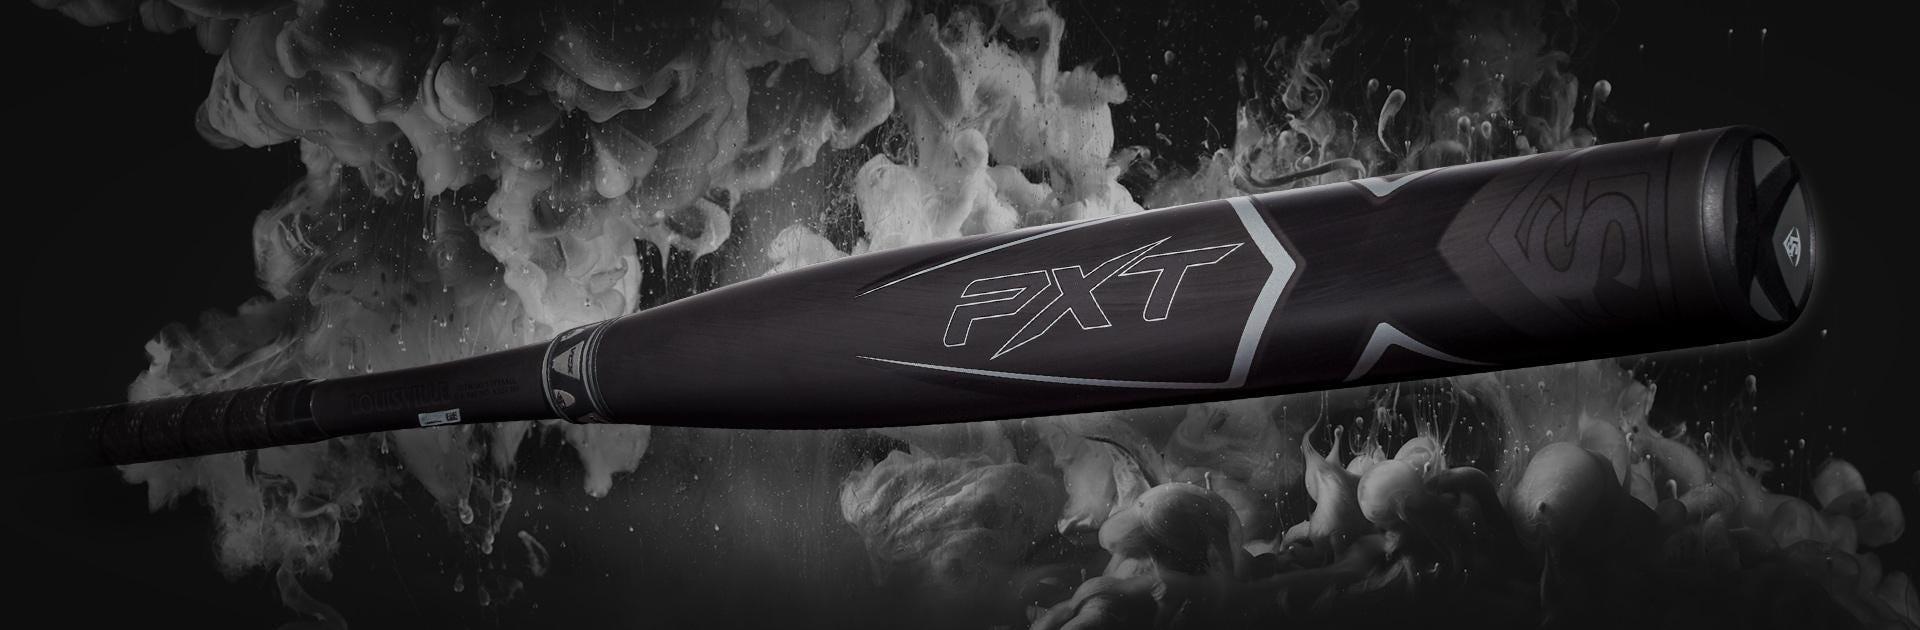 Slugger PXT SHadows Limited Edition Bat